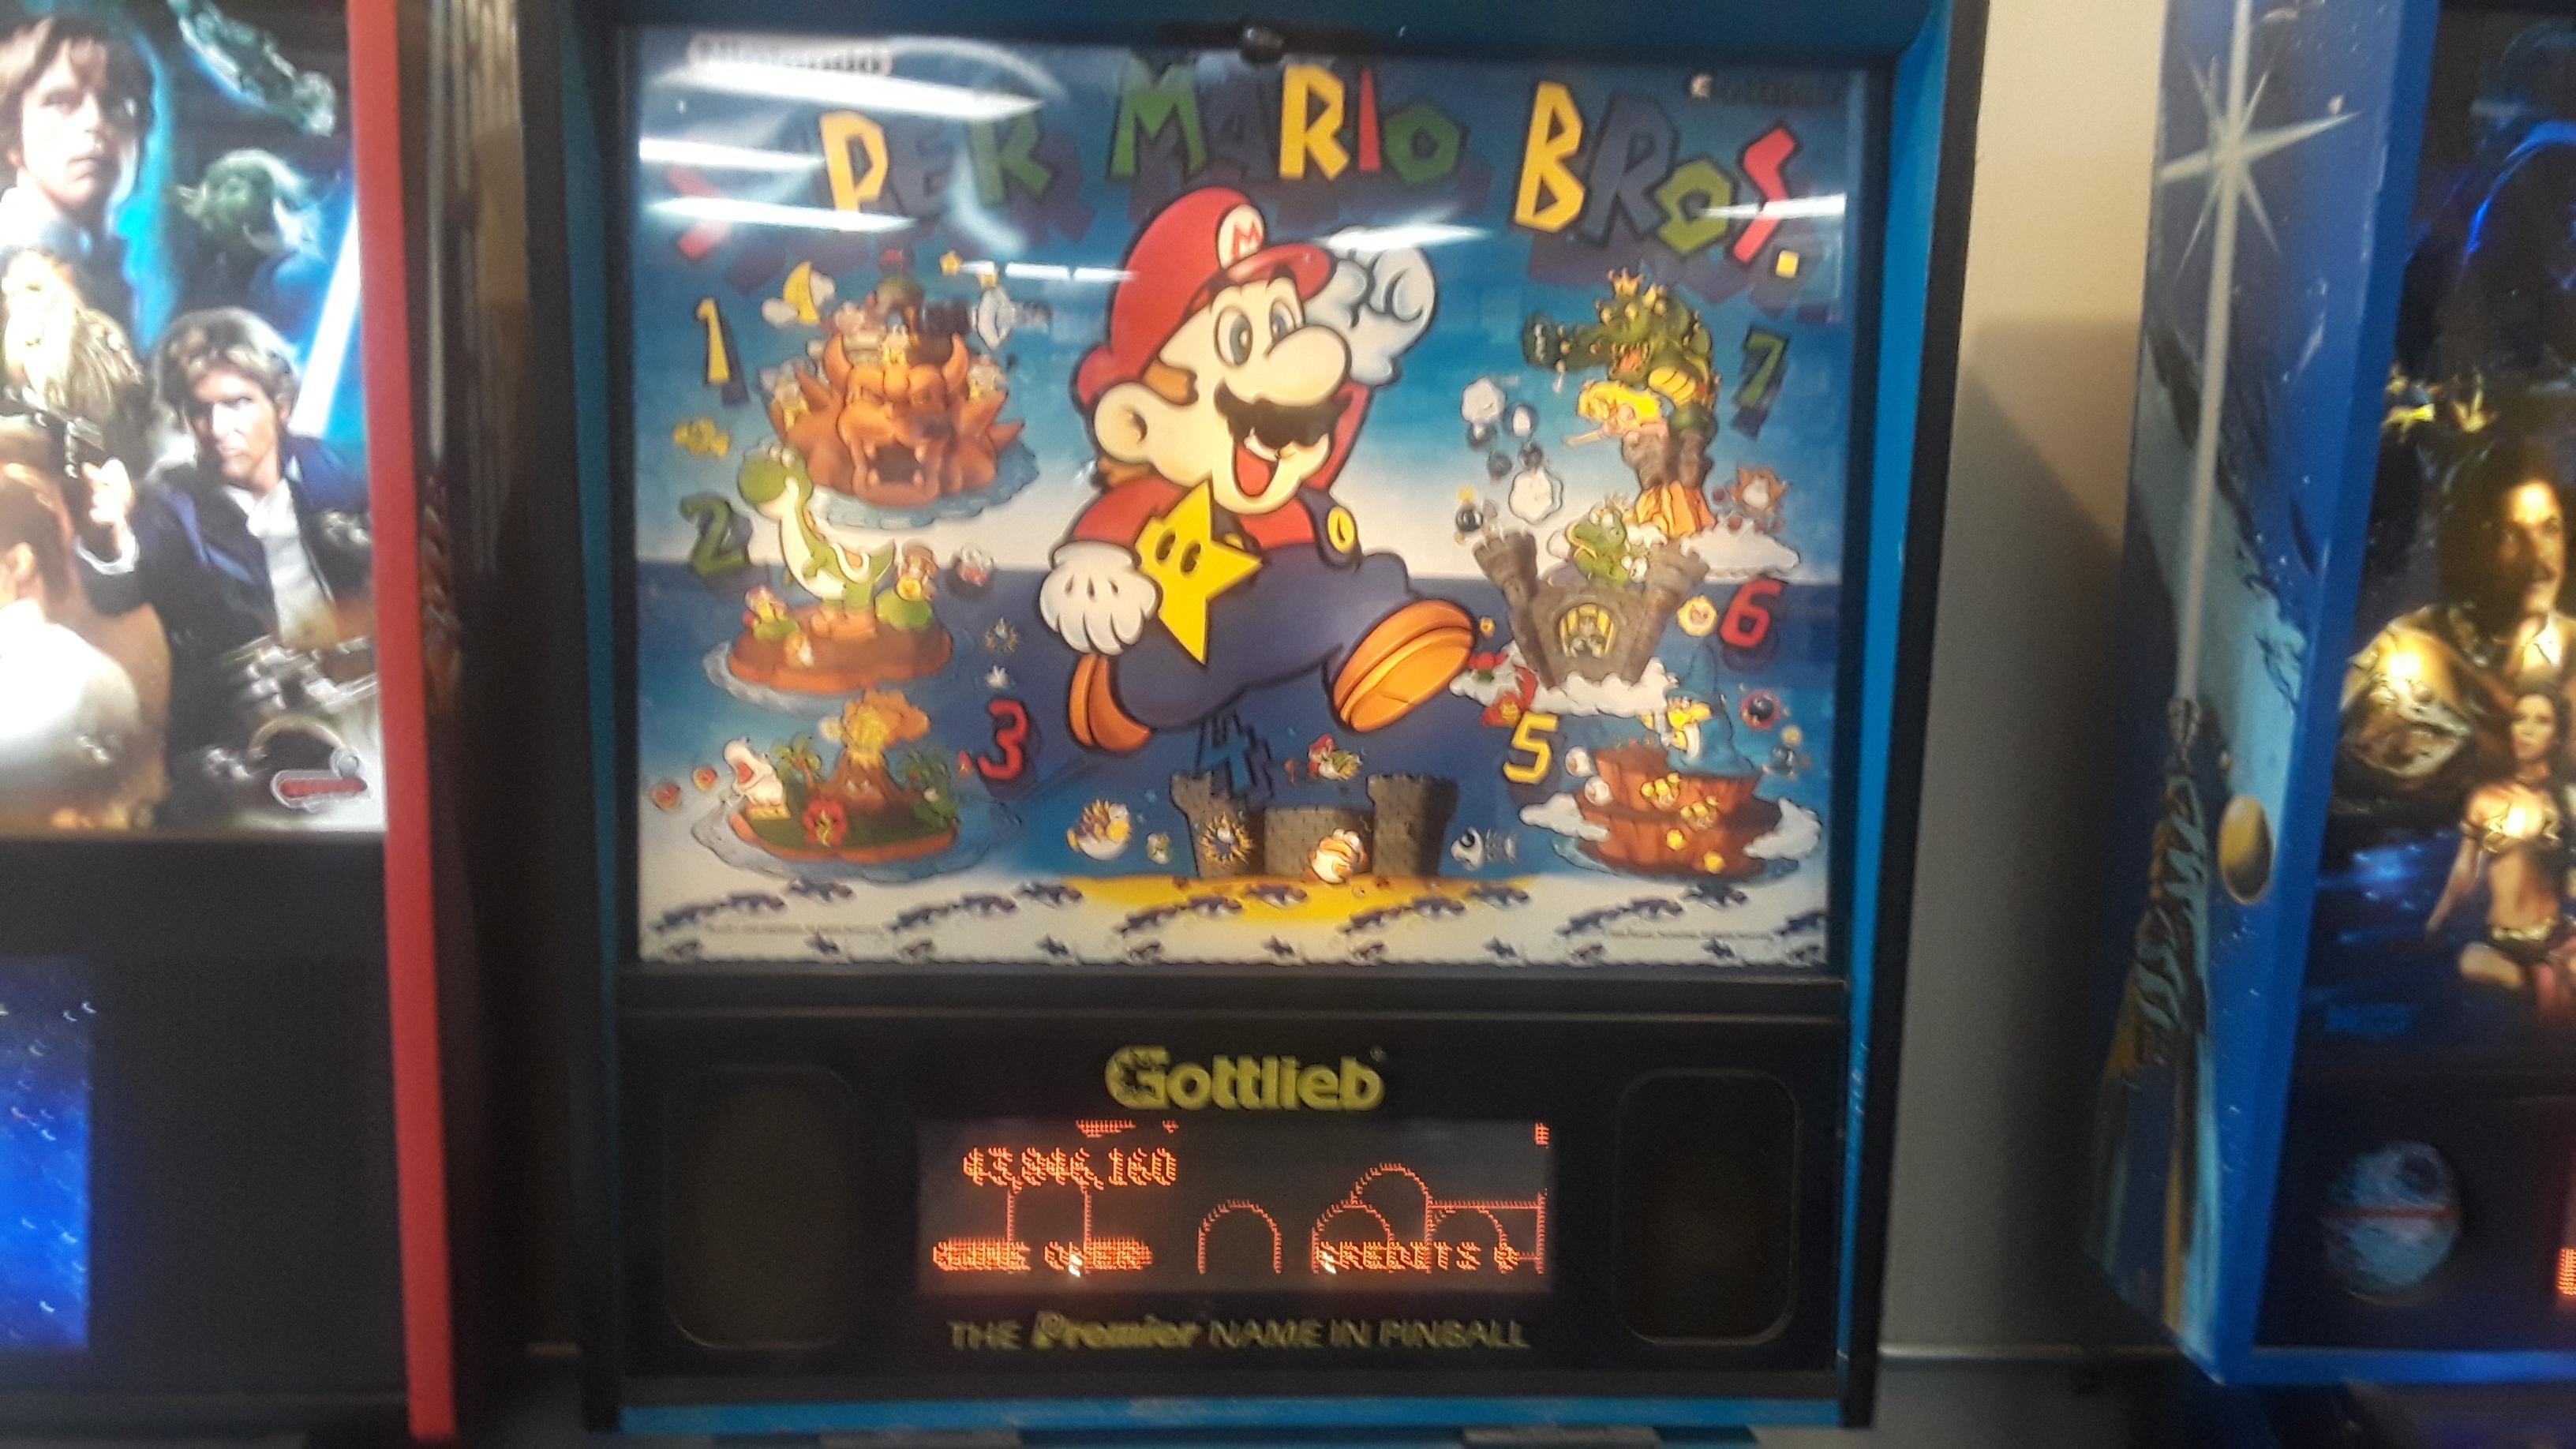 JML101582: Super Mario Bros. (Pinball: 3 Balls) 43,846,160 points on 2019-08-10 17:39:47